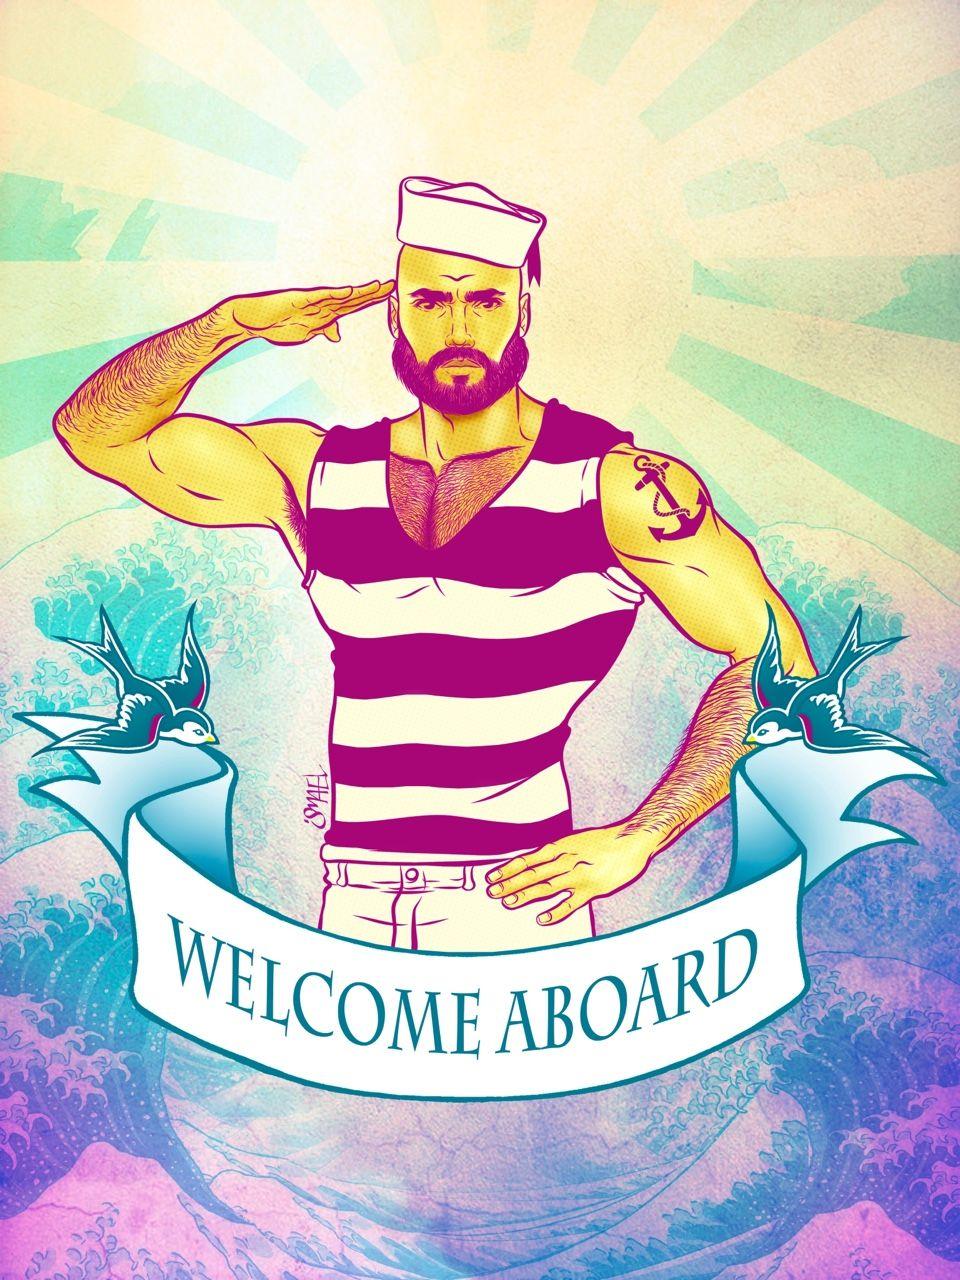 Ismaelalvarez Welcome Aboard Be Free Marbella Gay Festival